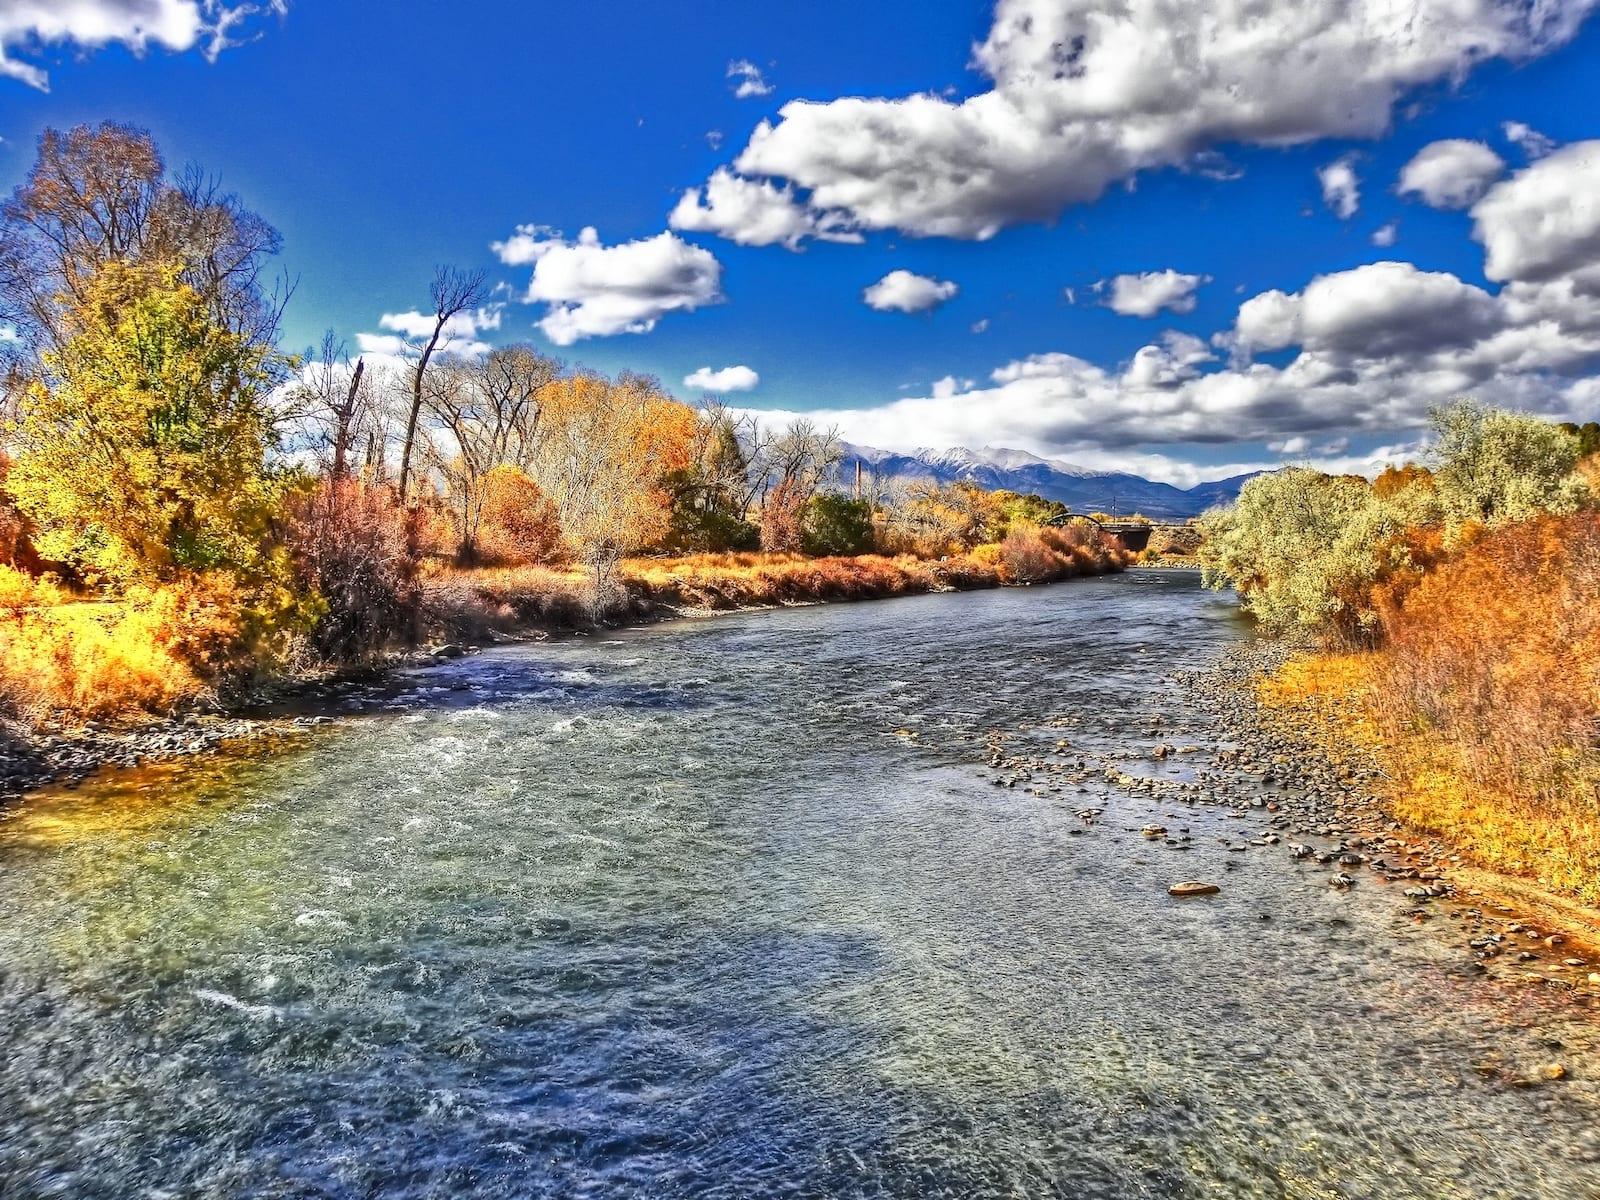 Arkansas river in October, CO